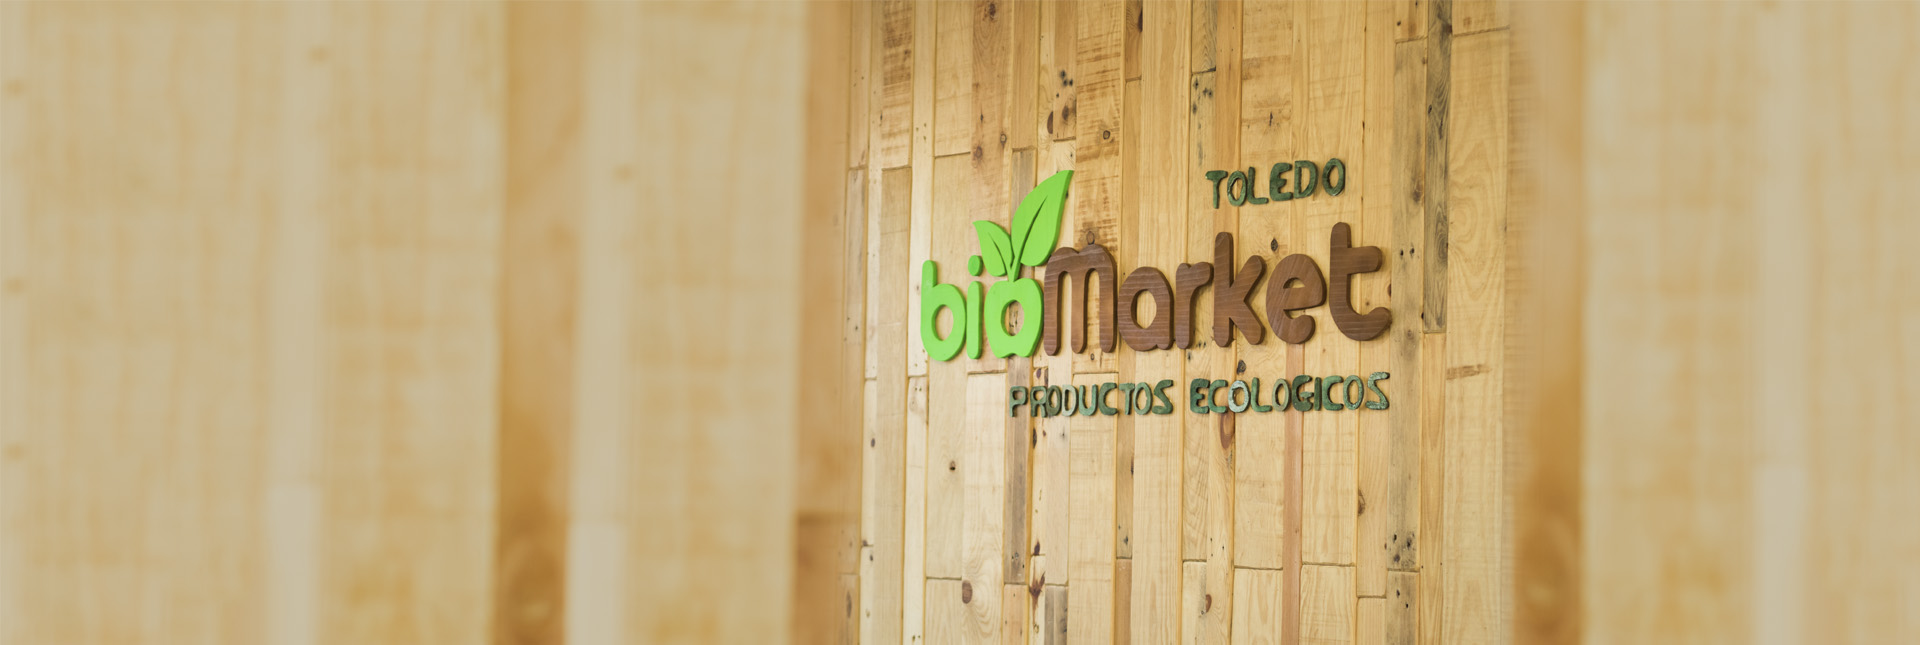 slider1 biomarket